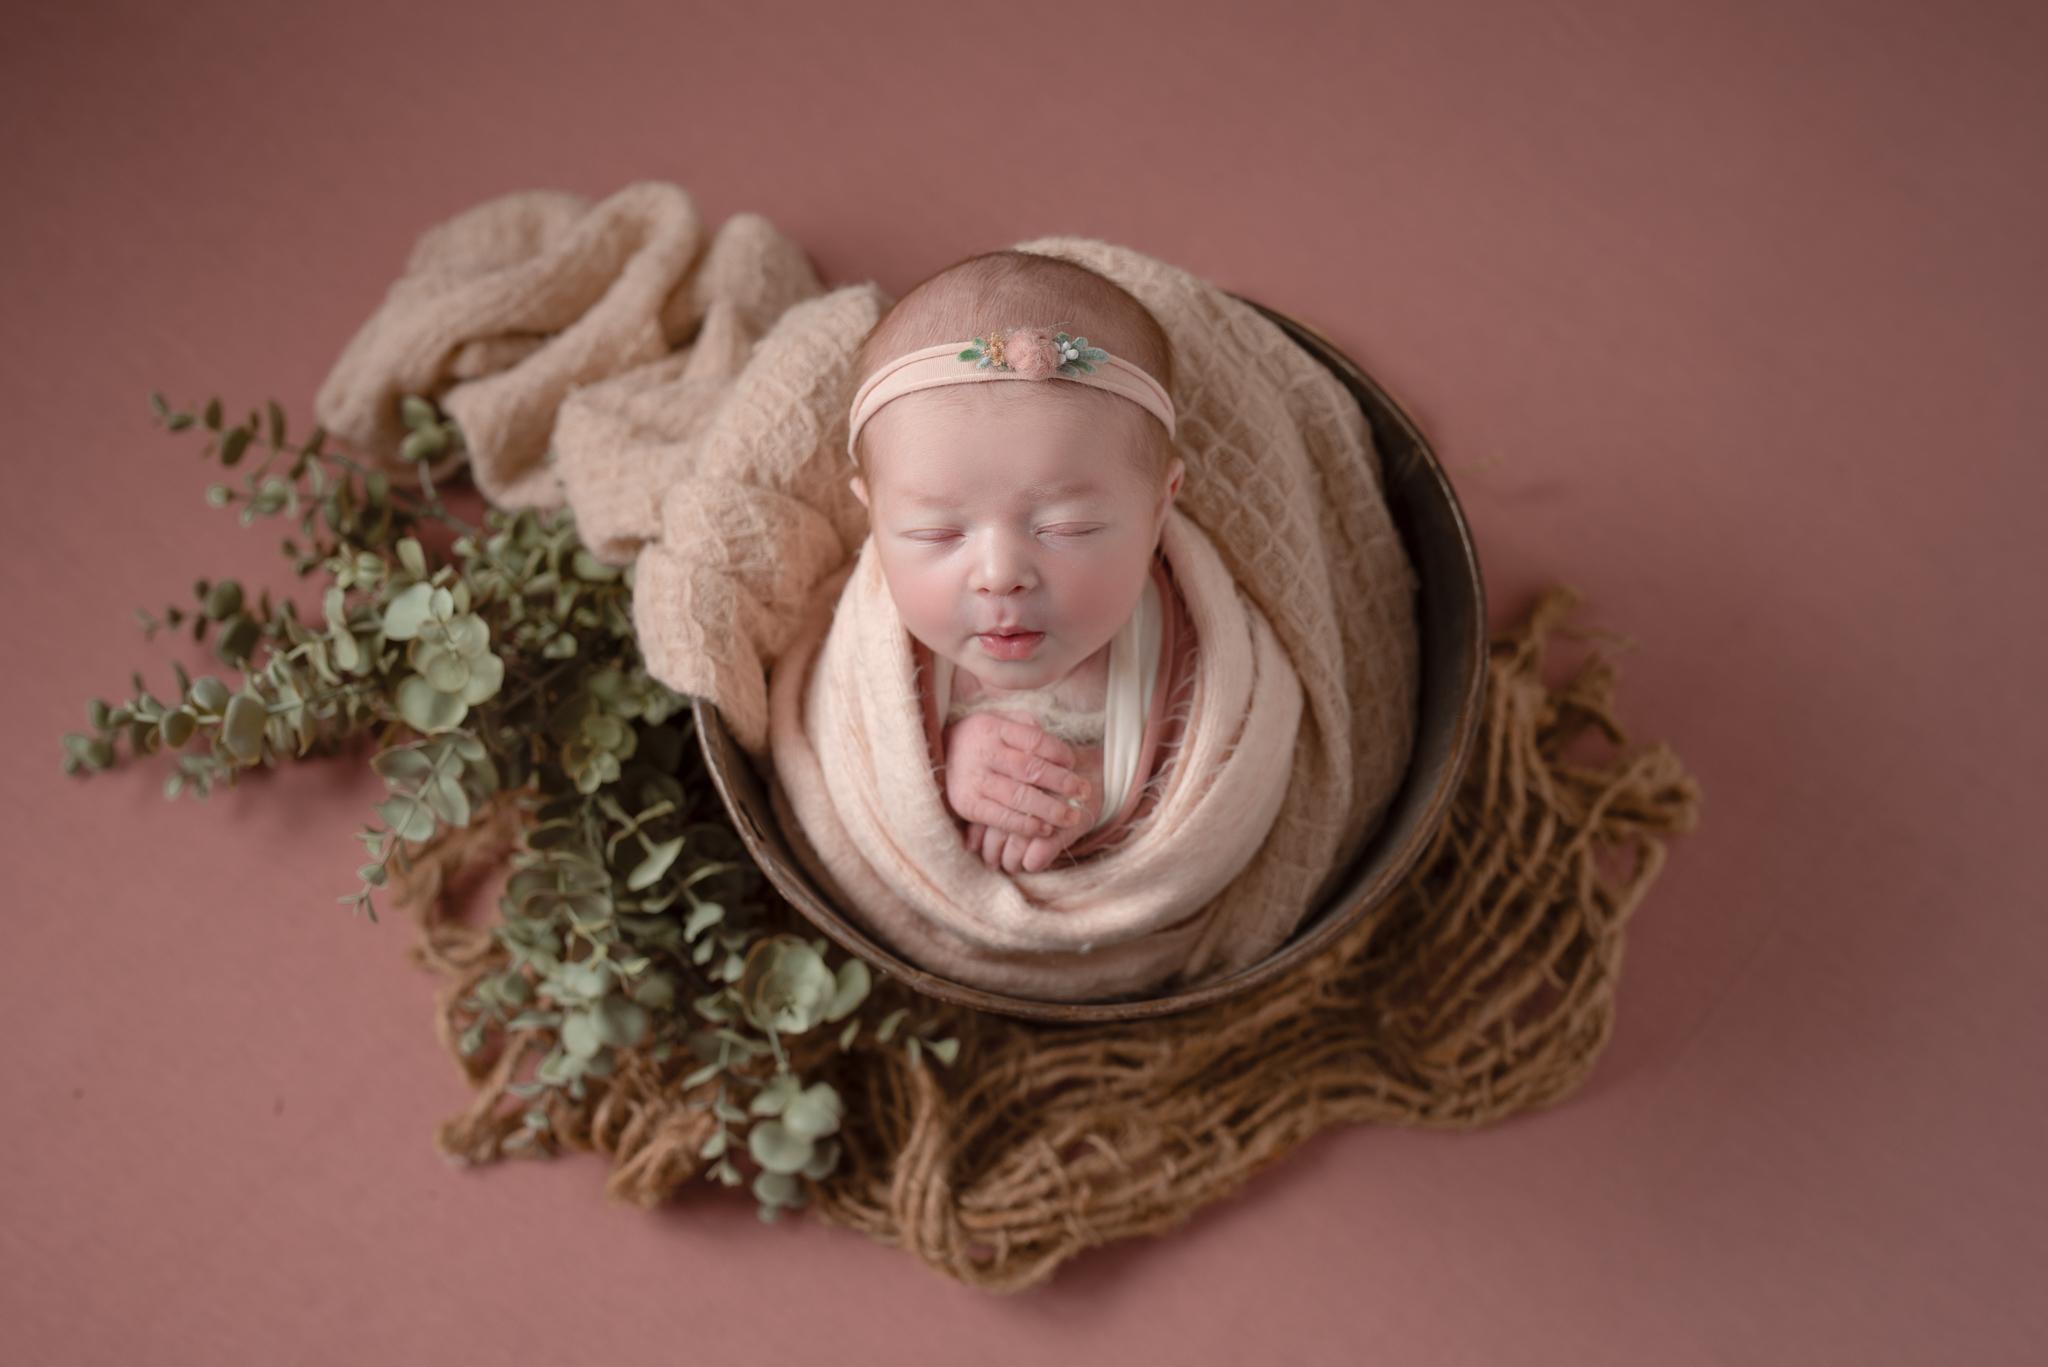 Newborn276NaomiLuciennePhotography032019-Edit.jpg